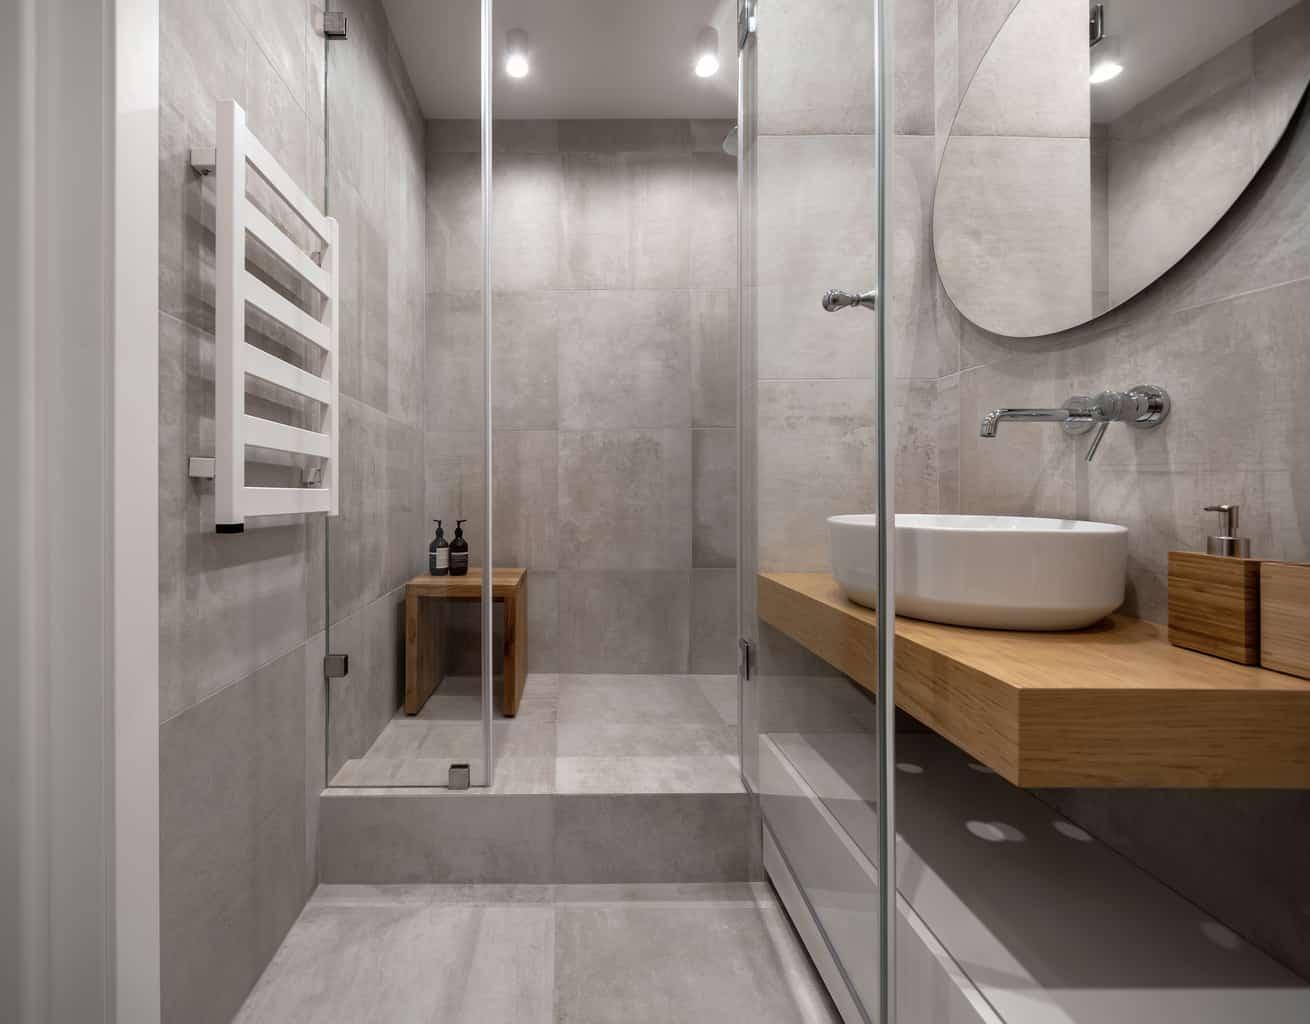 tiling the shower ceiling